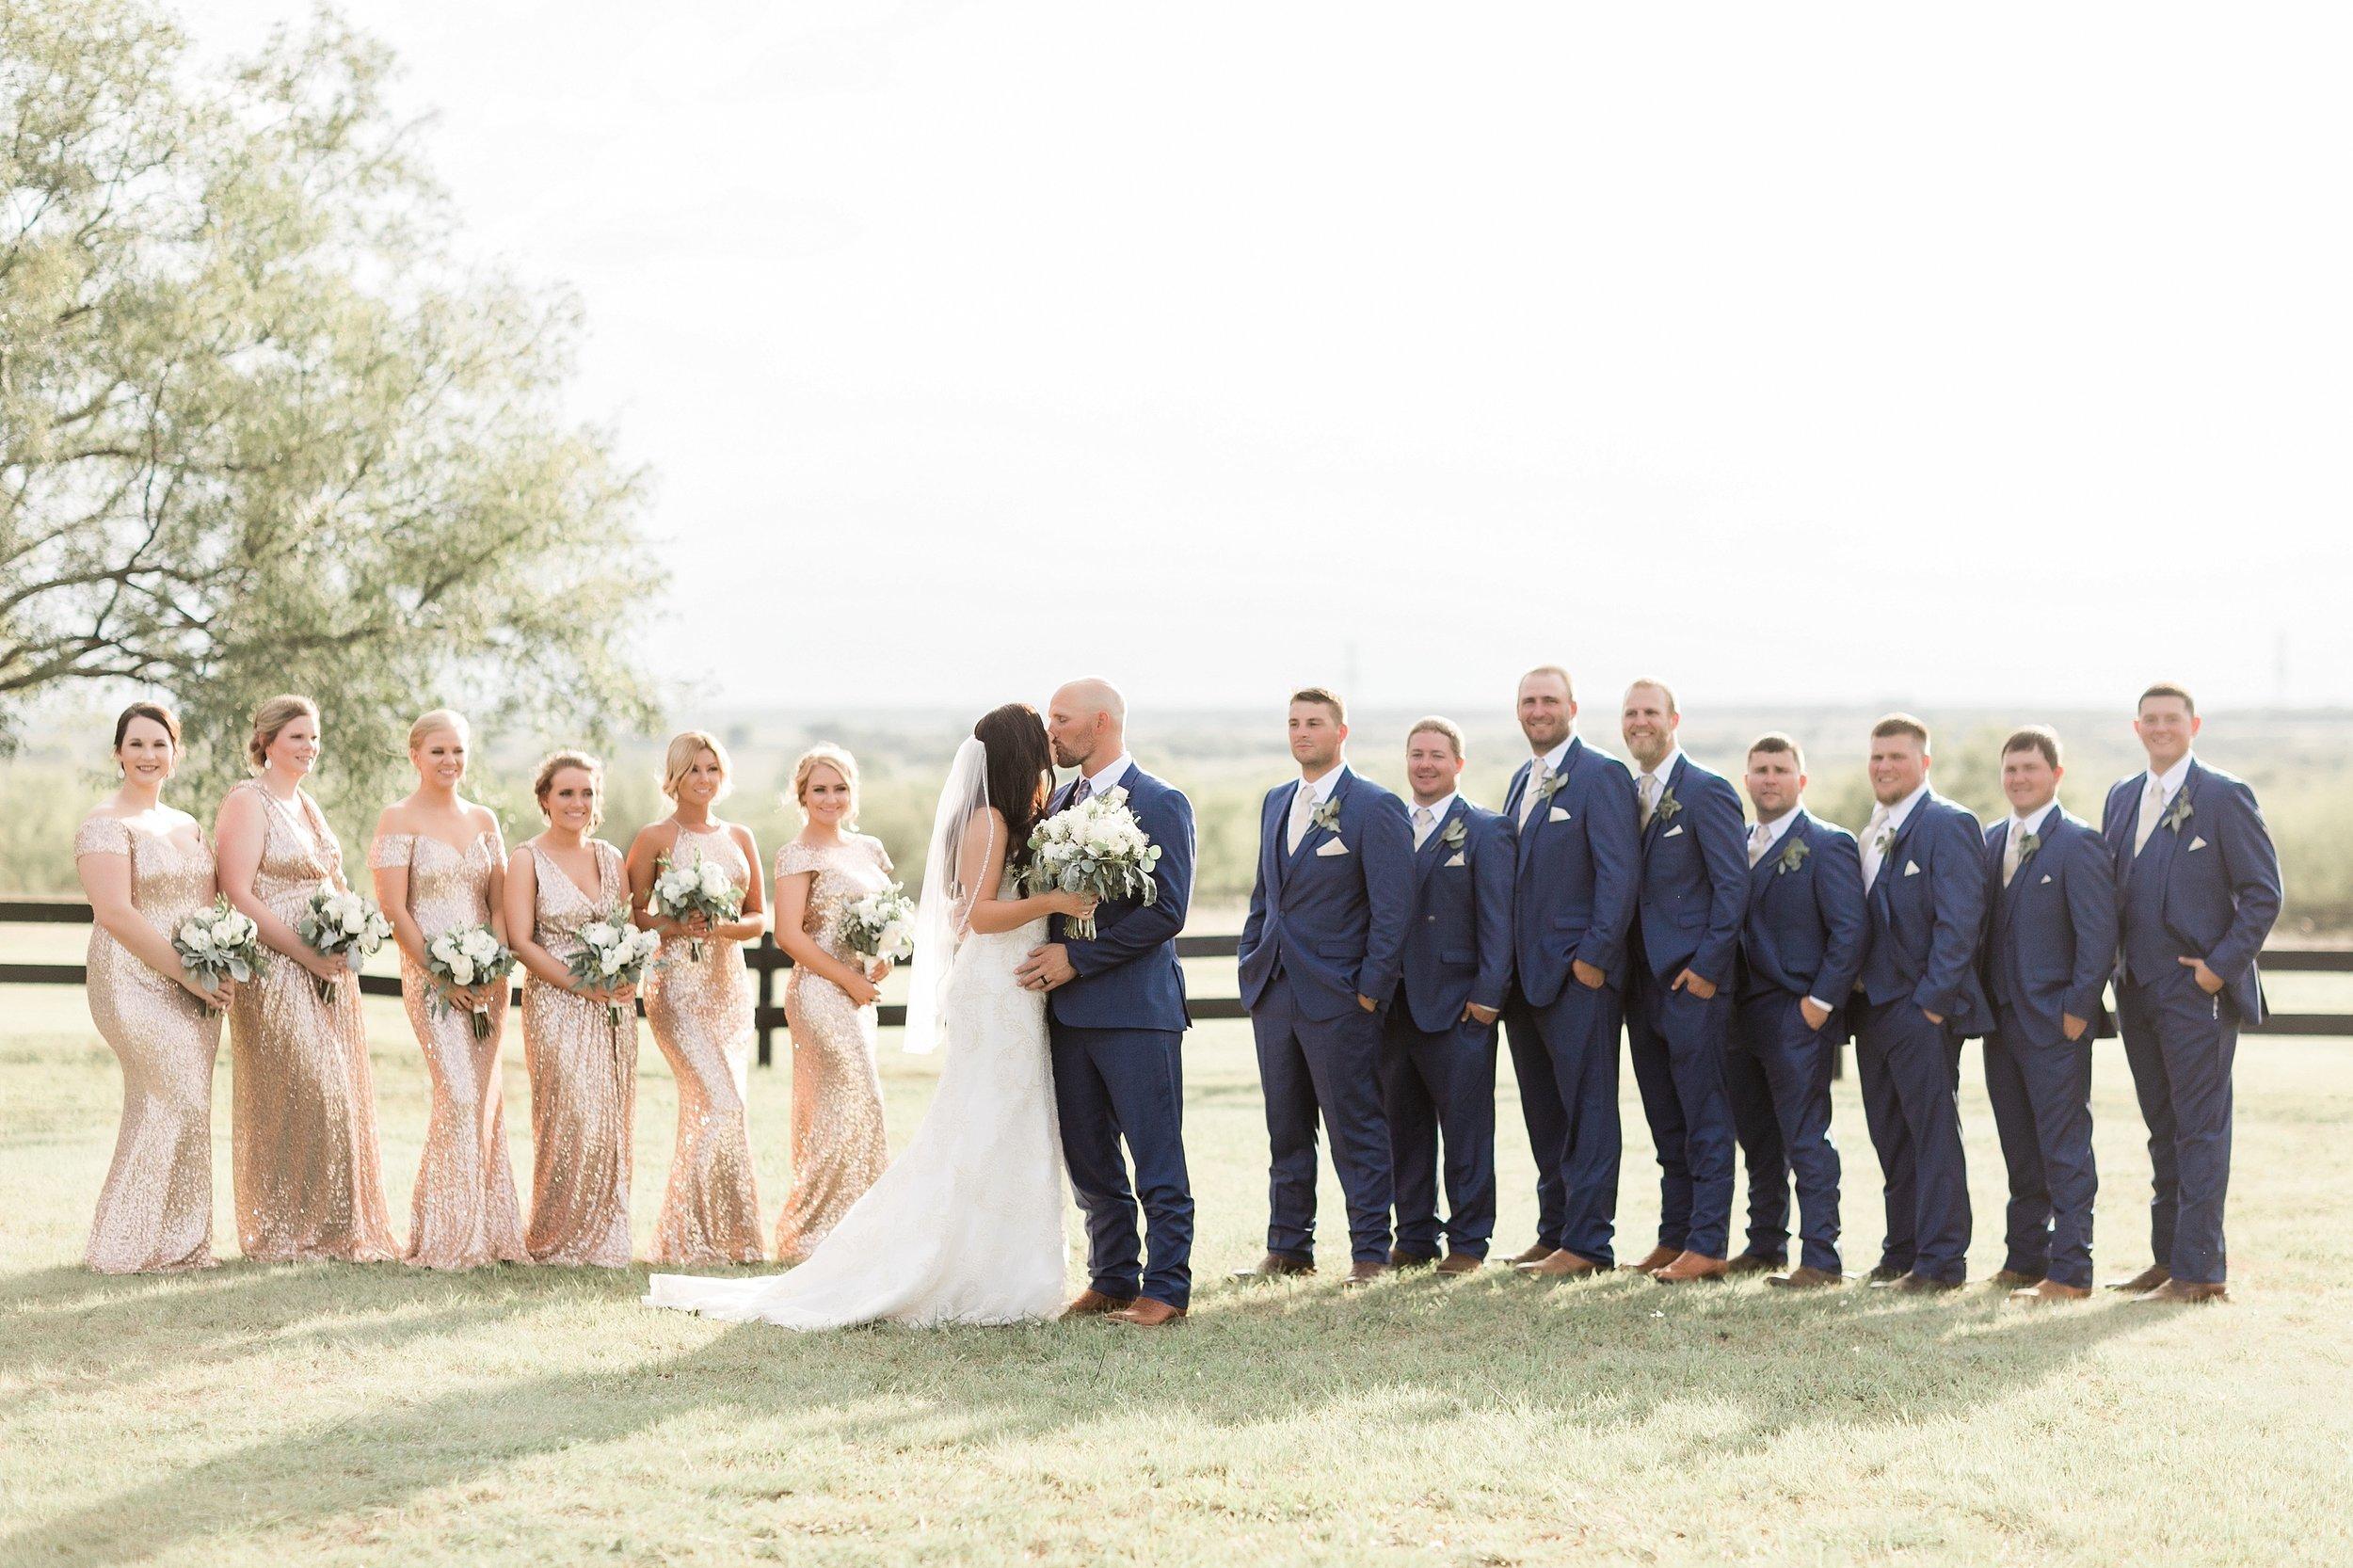 bailey-and-carl-coyote-ranch-resort-wedding-photographer-wichita-falls-texas-destination-wedding-0033.jpg